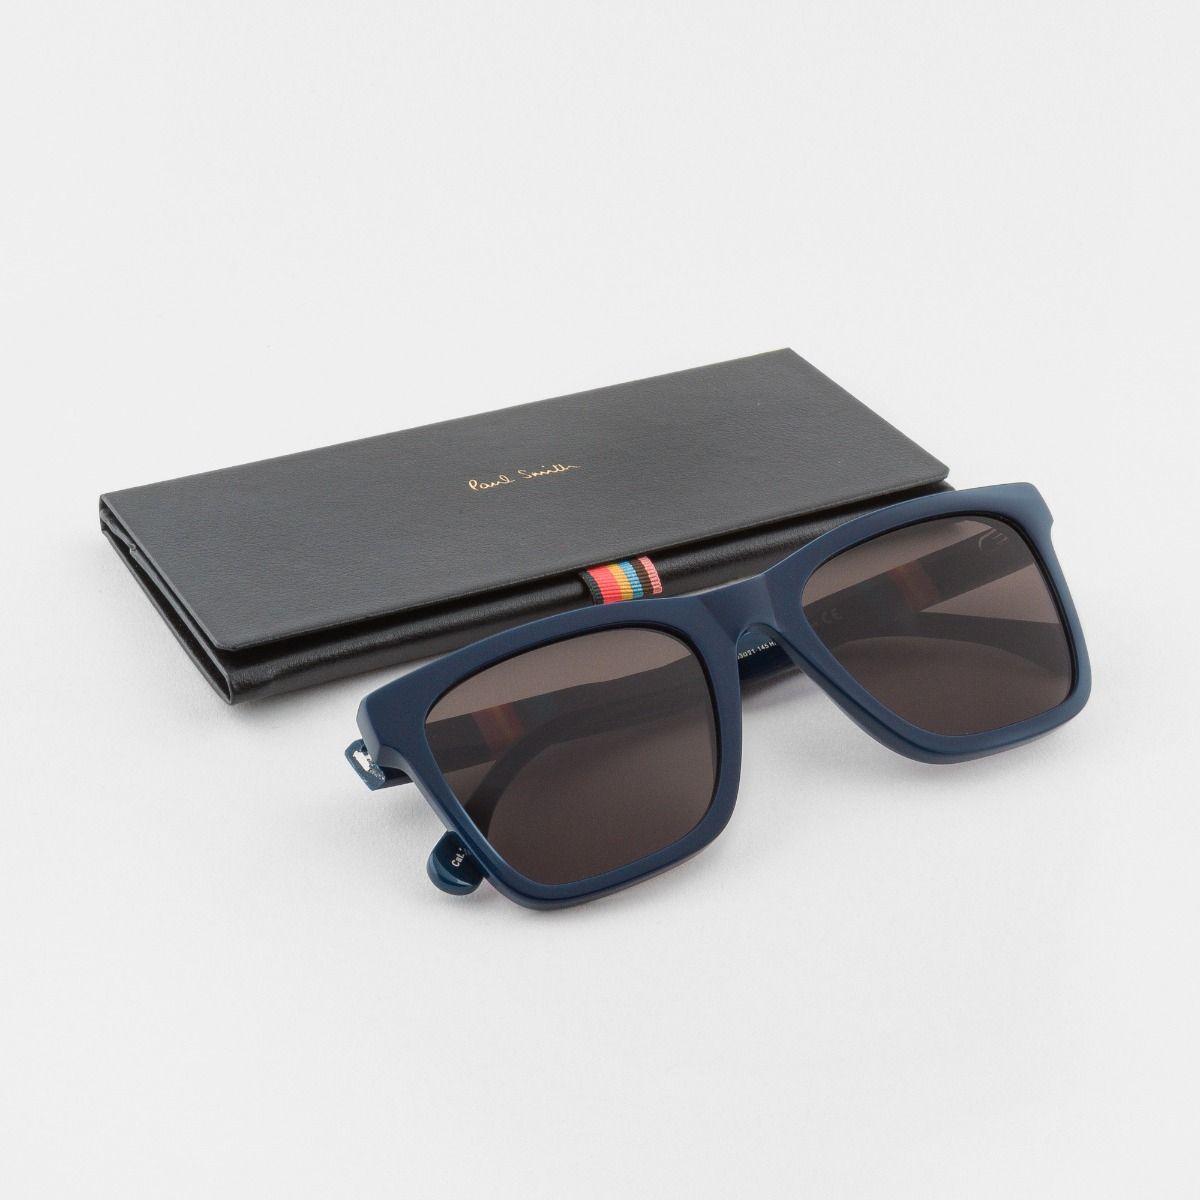 Paul Smith Durant Square Sunglasses